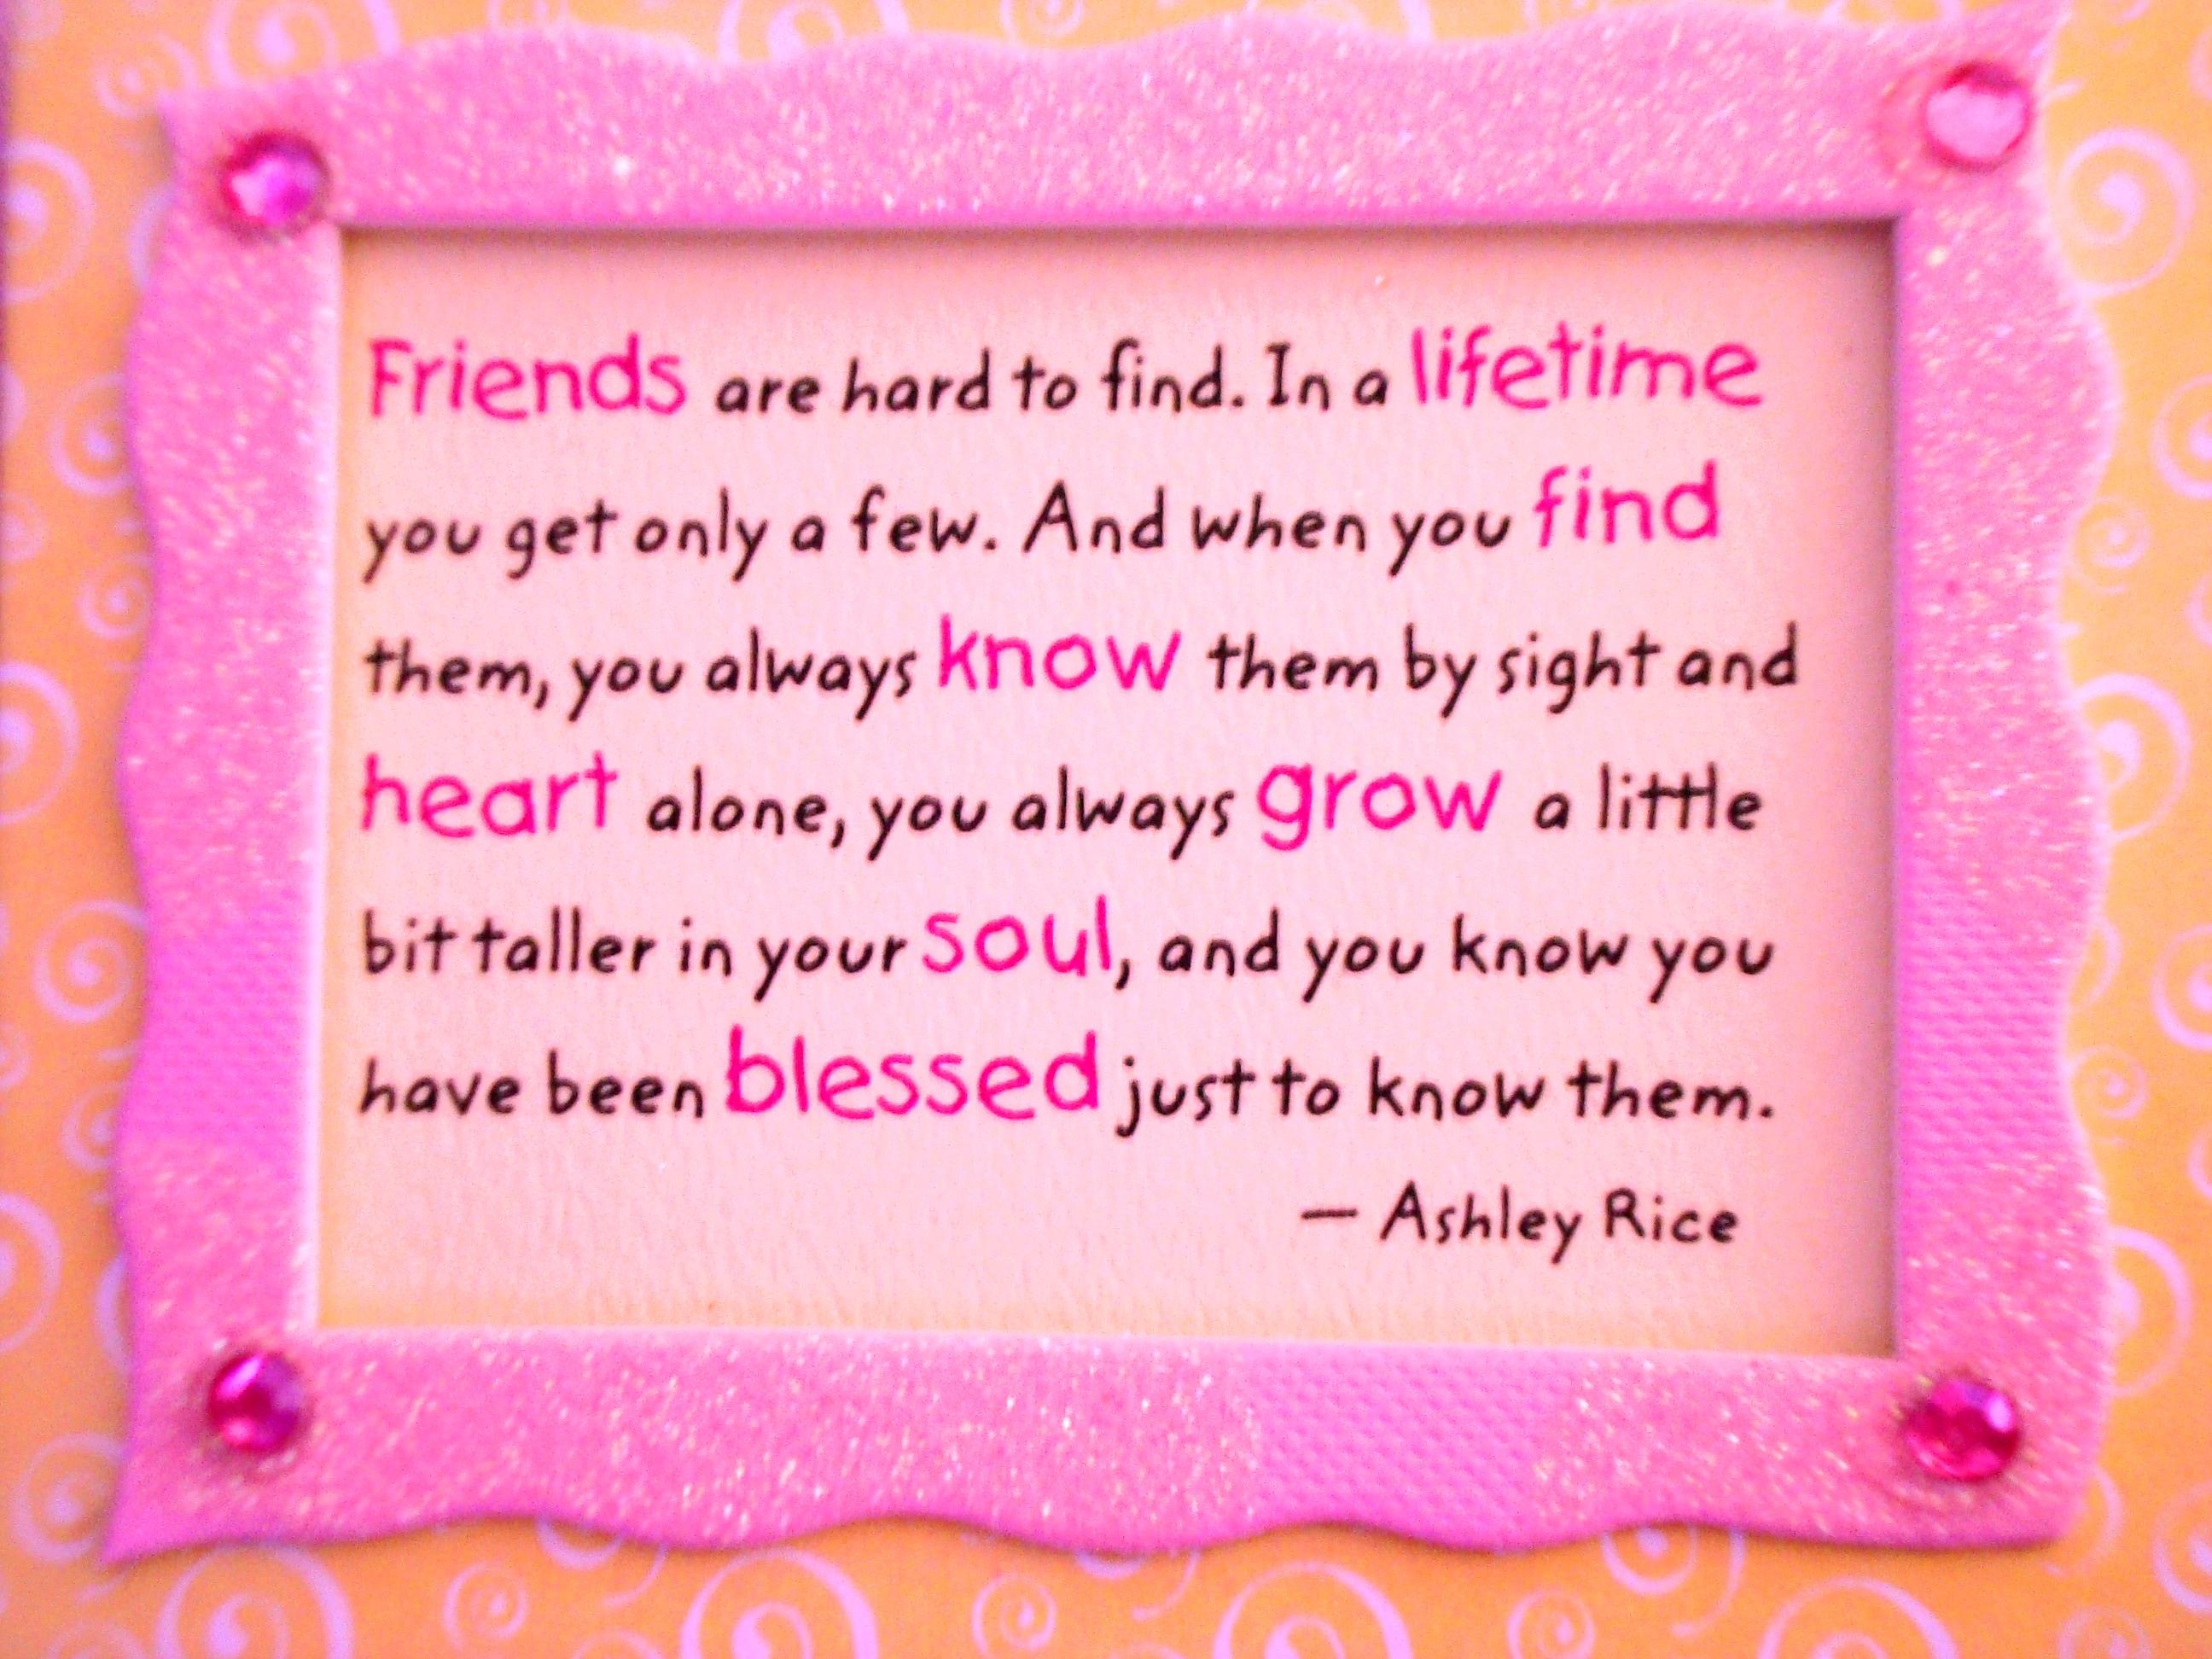 Friend quote #2